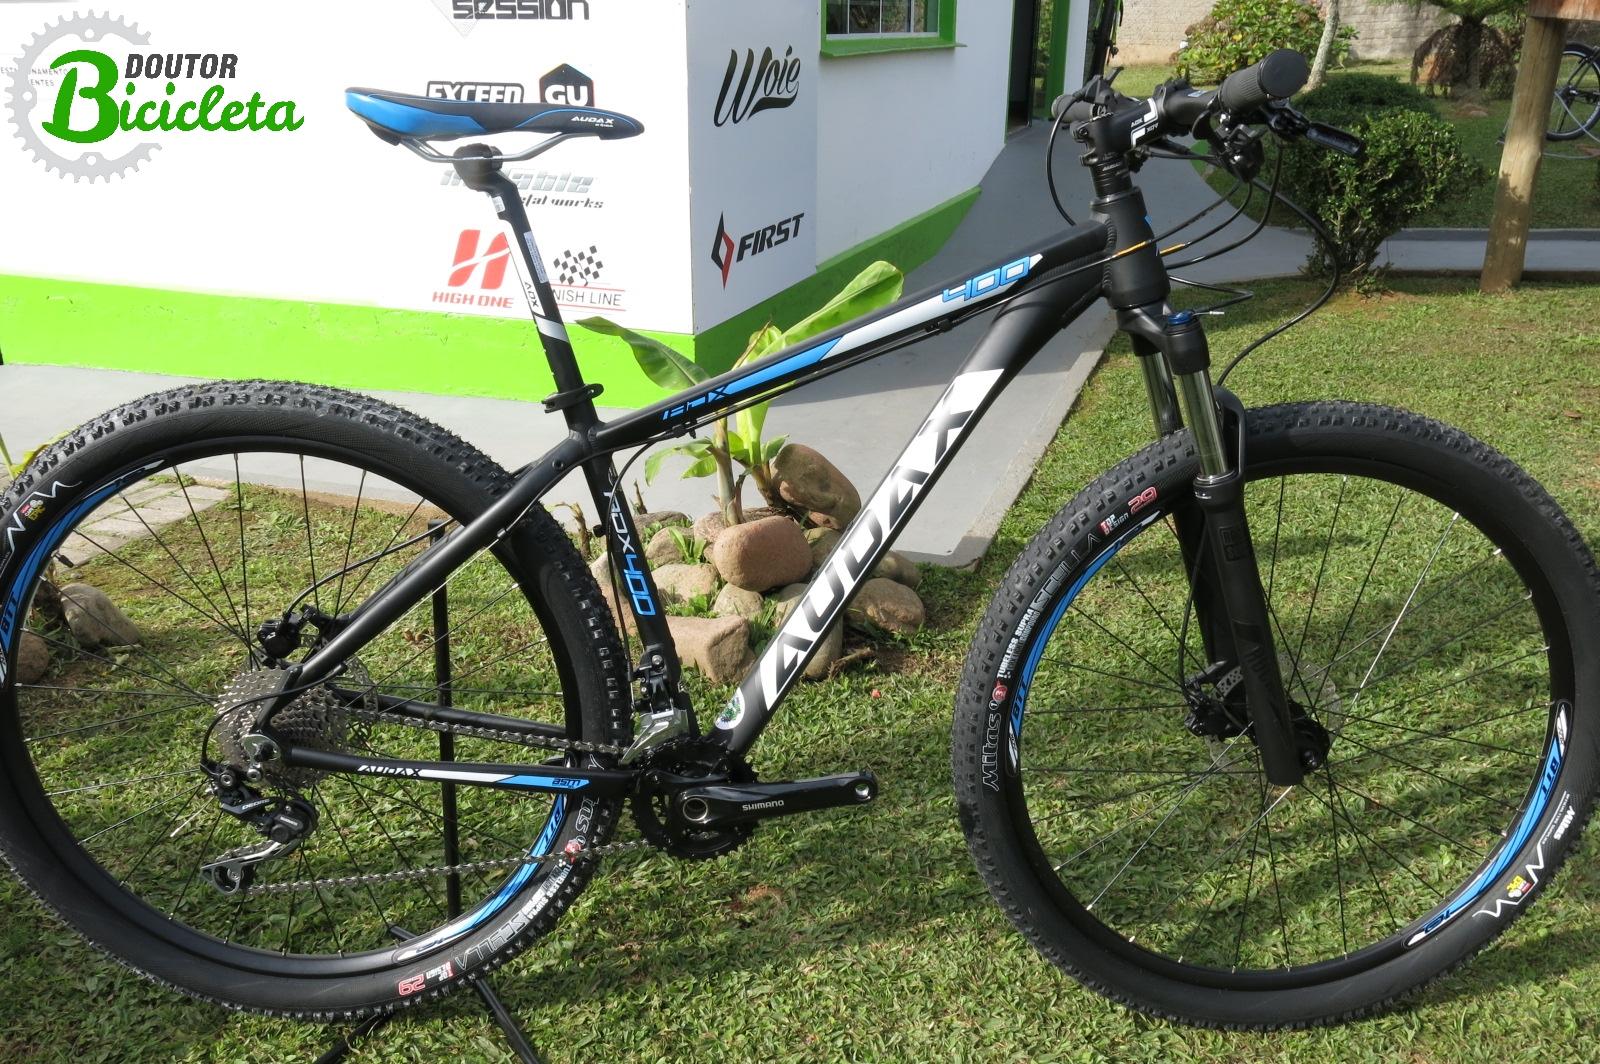 A Bicicleta Audax ADX 400